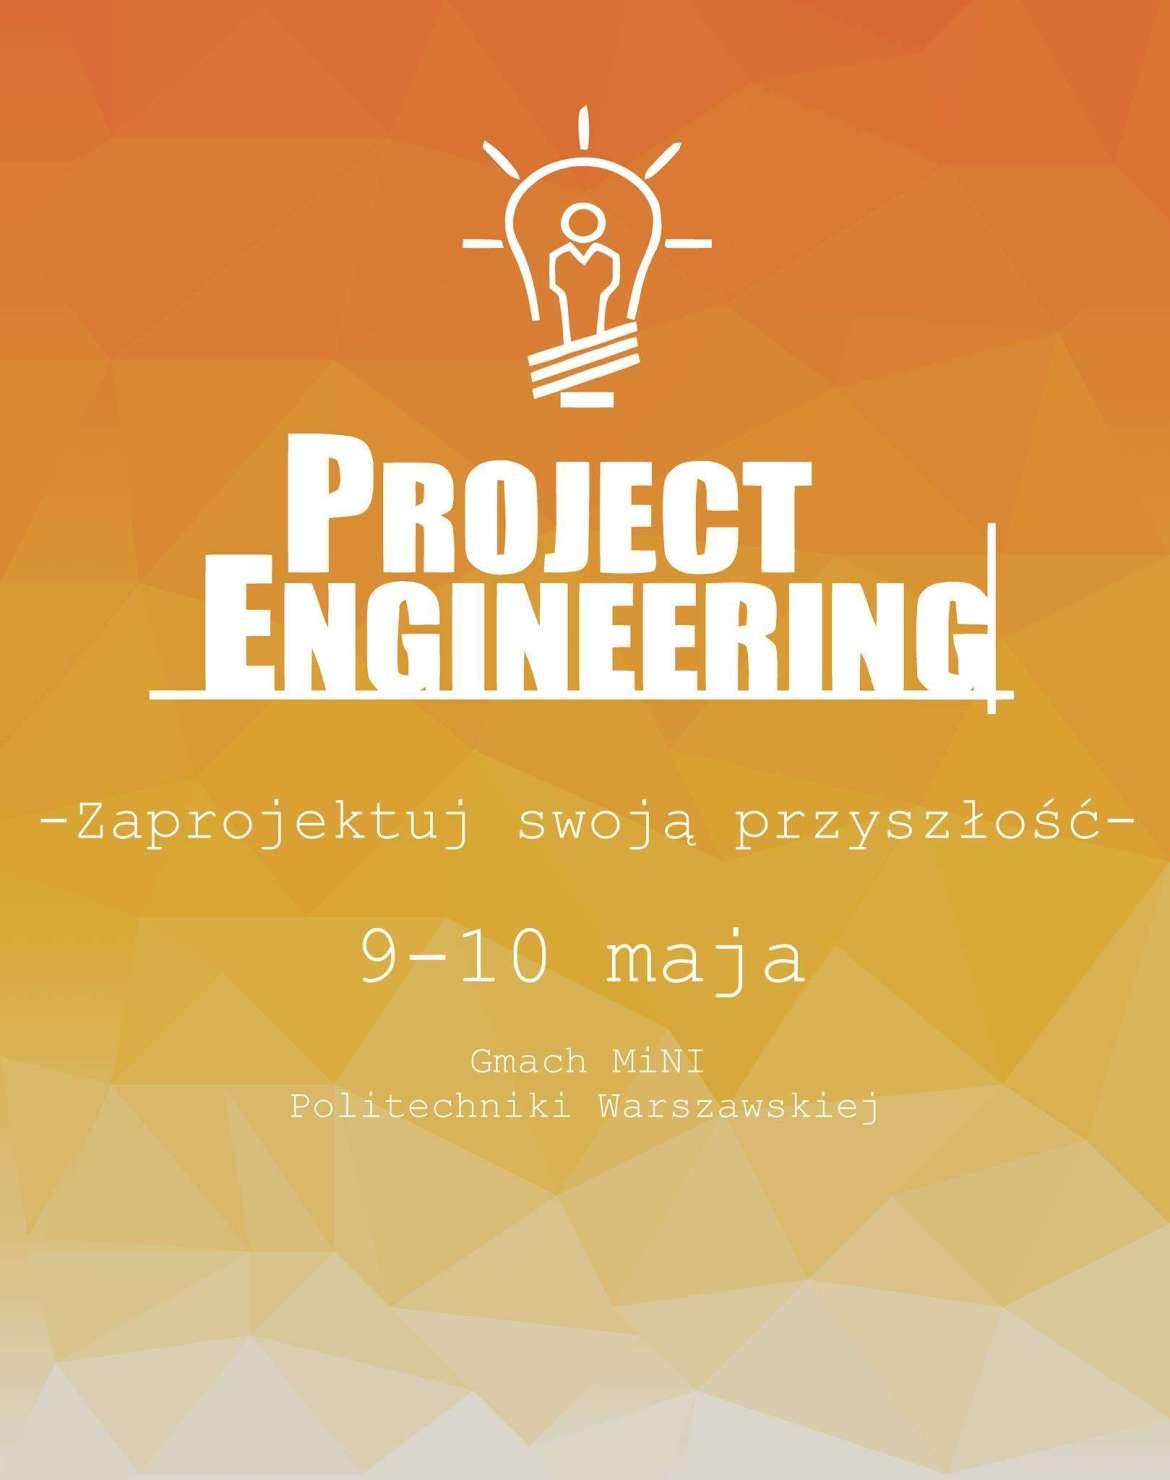 Rusza siódma edycja Konferencji Project Engineering